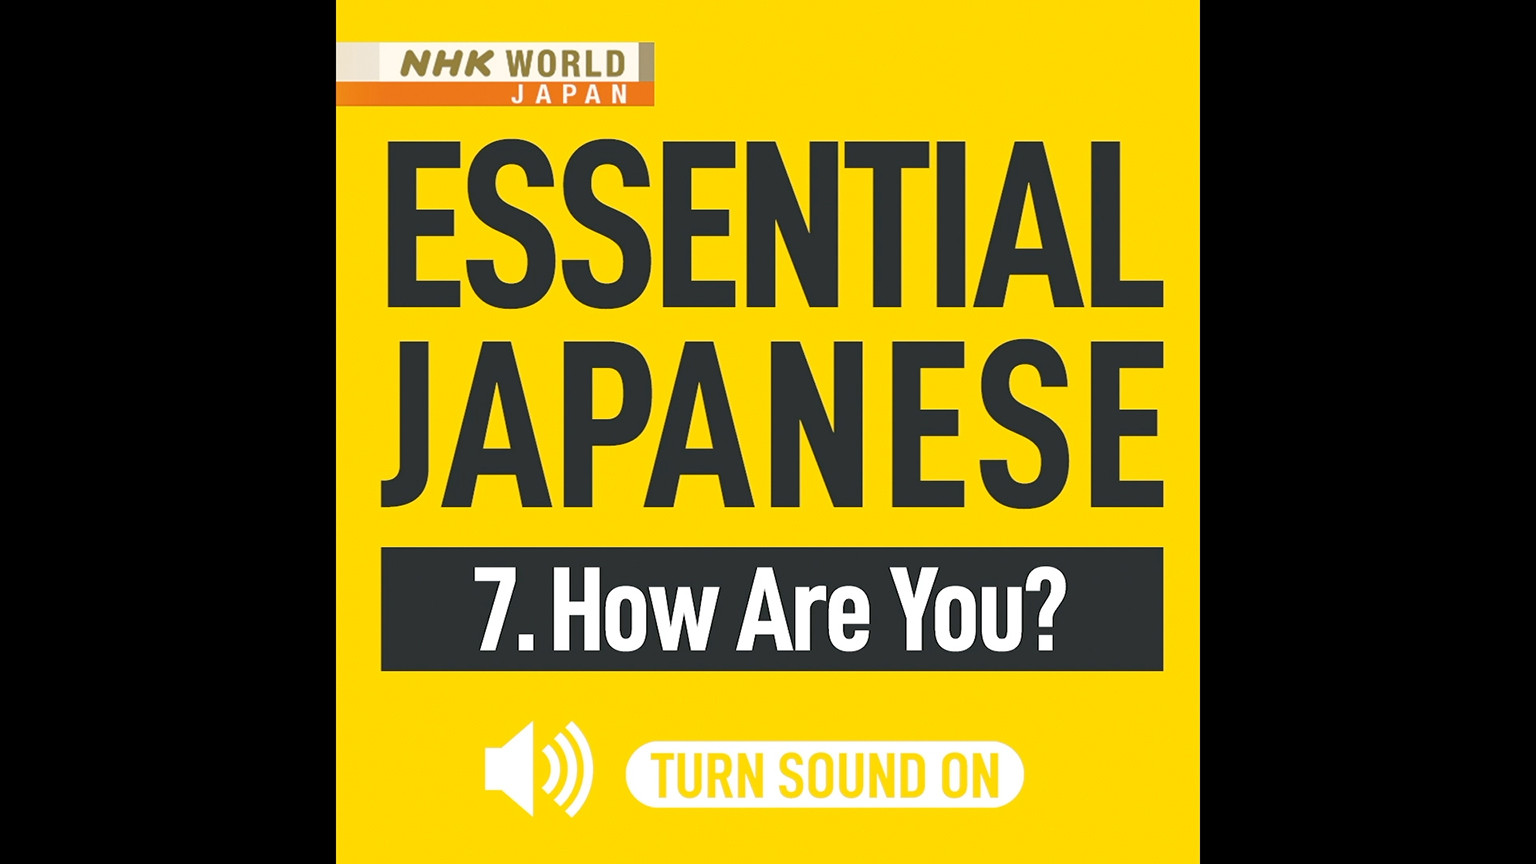 News japanese language in nhk